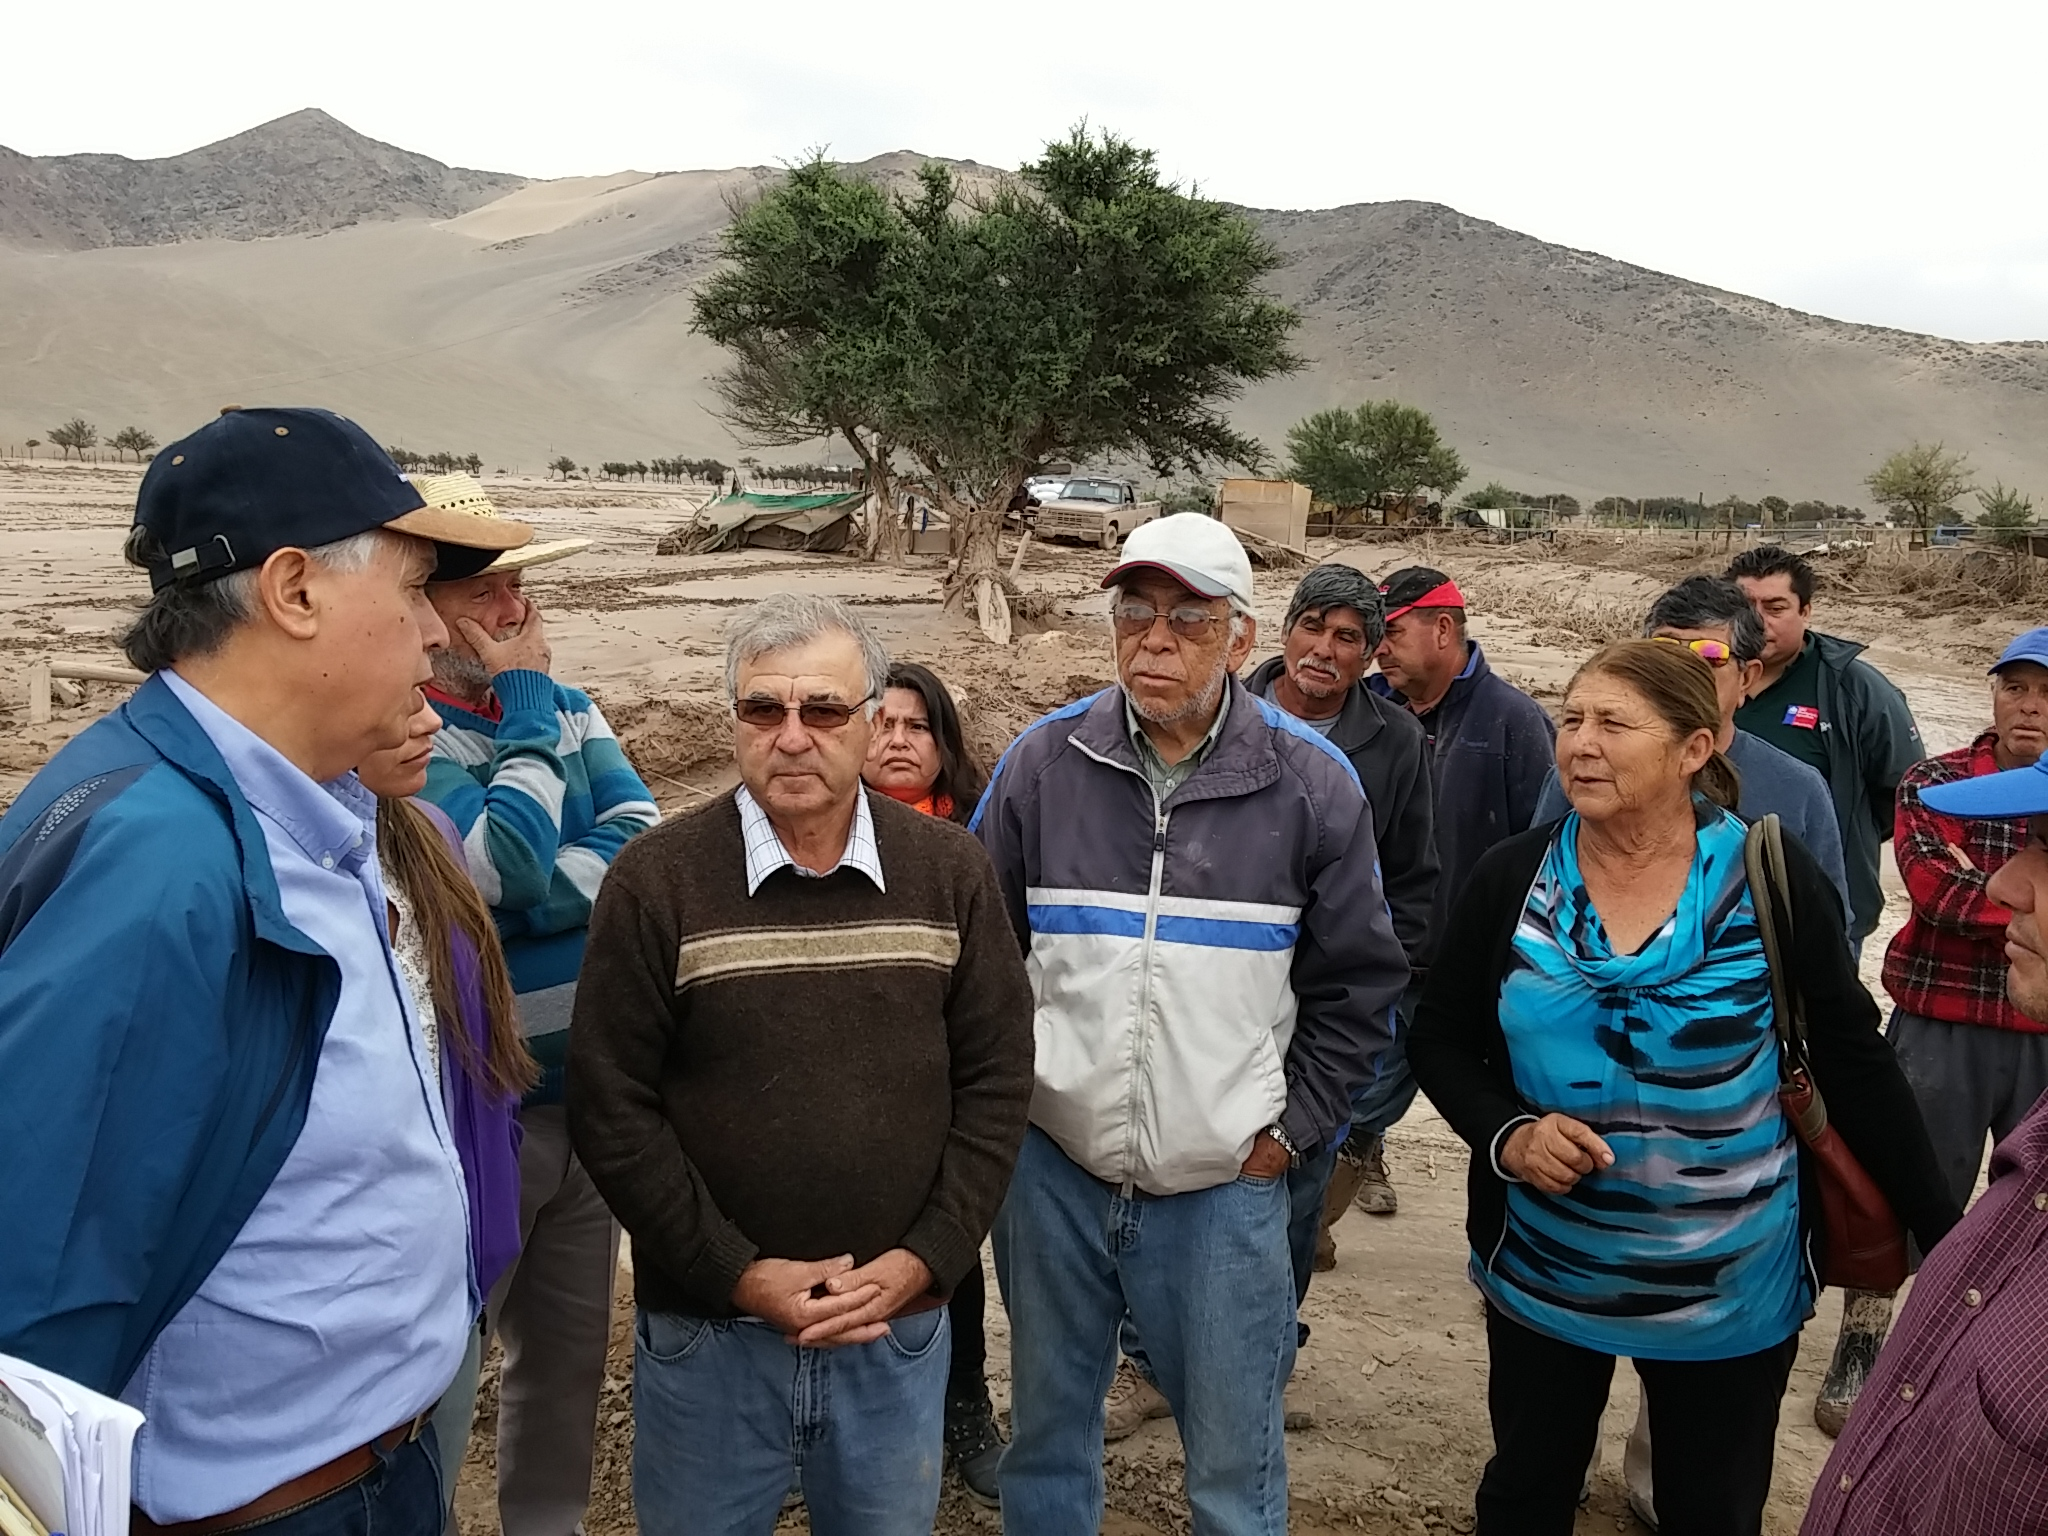 Minagri pone en marcha plan para recuperar infraestructura agrícola de Atacama